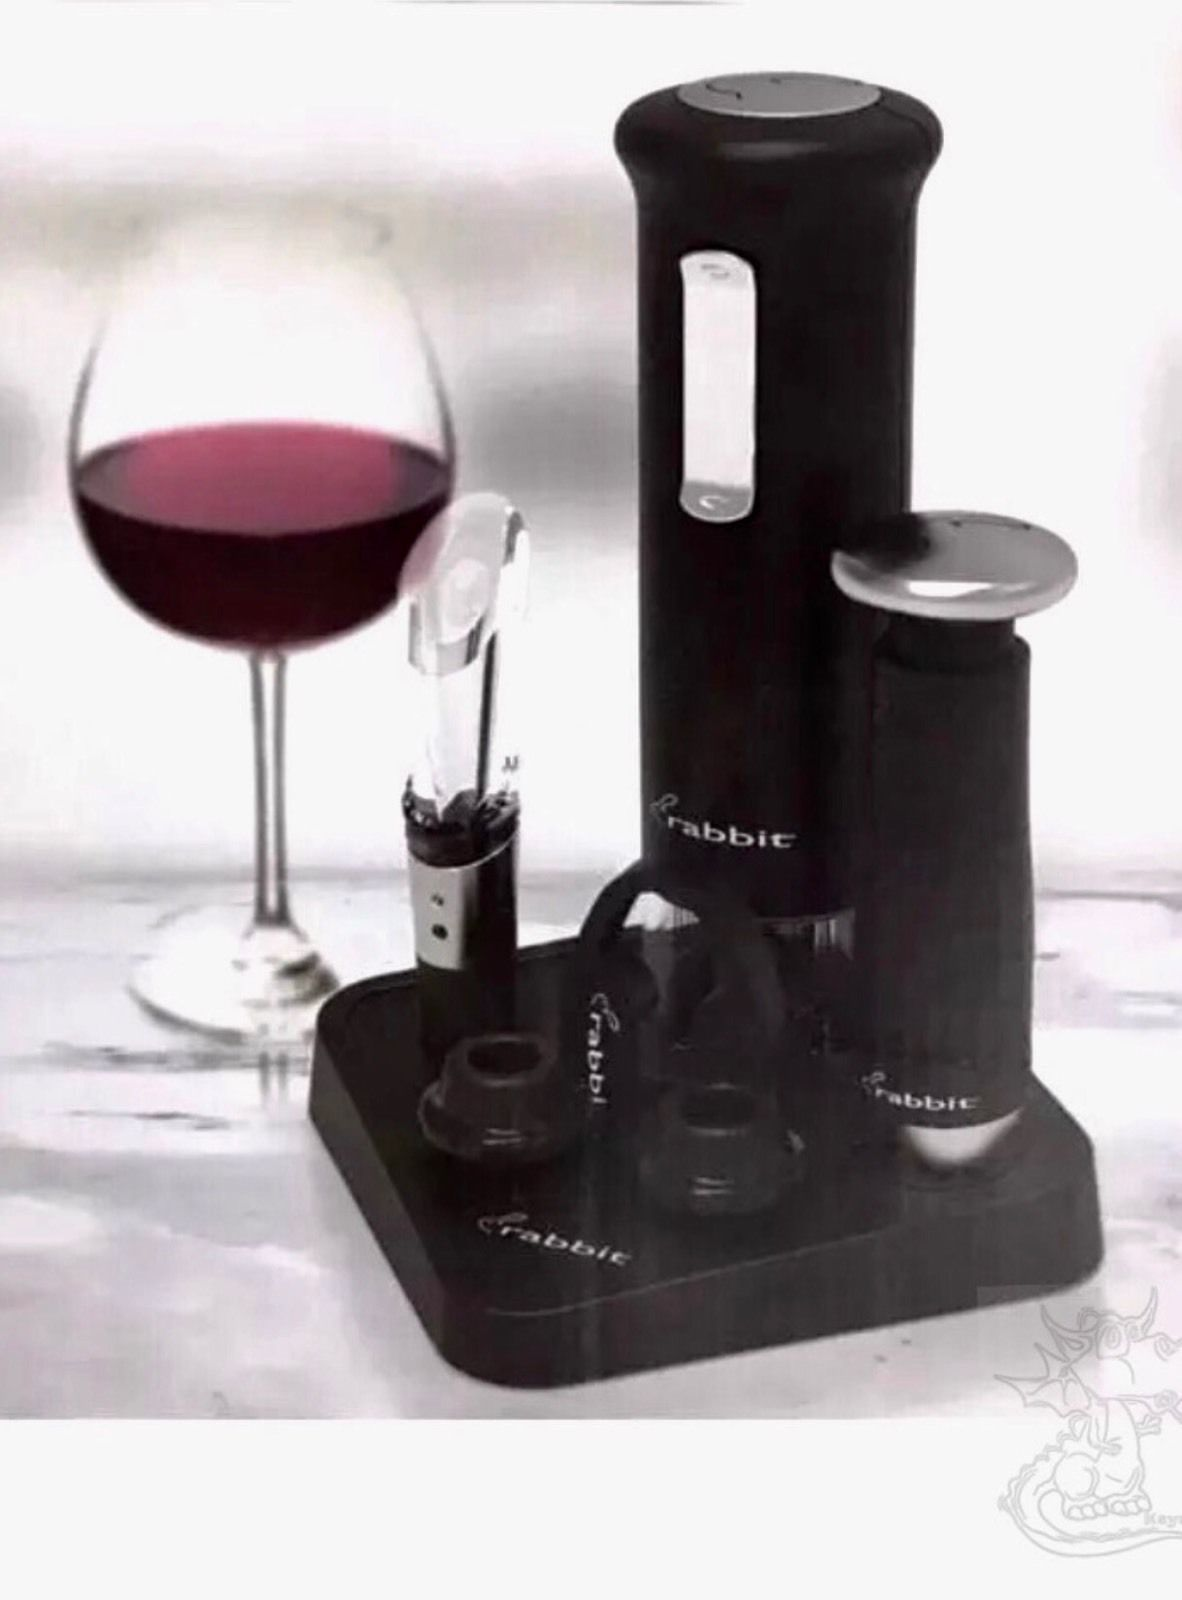 Rabbit Electric Wine Set Corkscrew Foil Cutter Preserver Aerator Charger  Barware